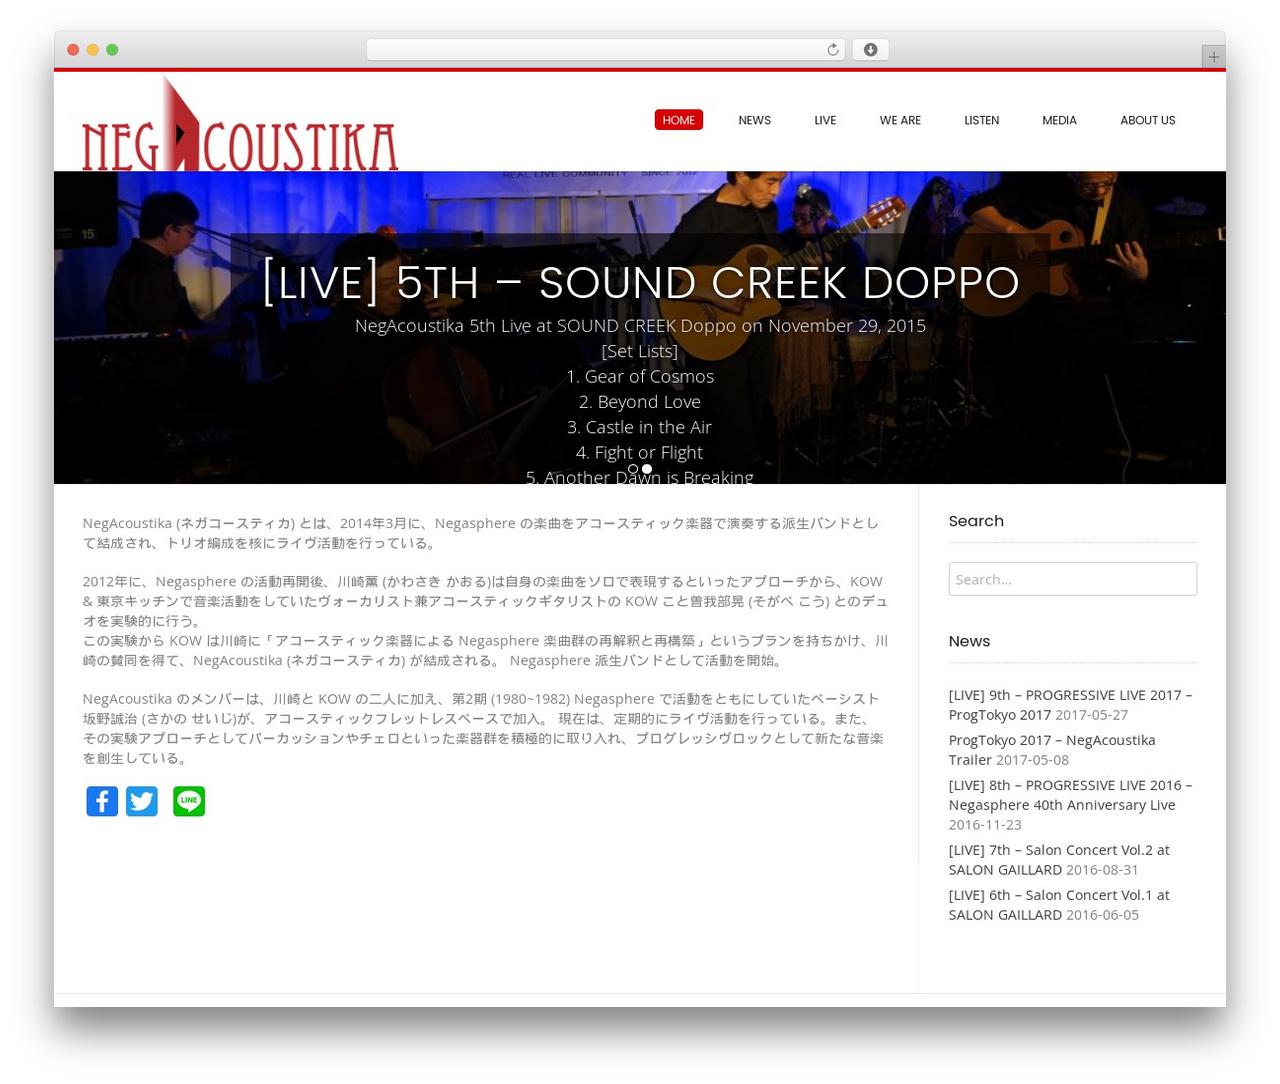 WordPress theme Conica - negacoustika.com